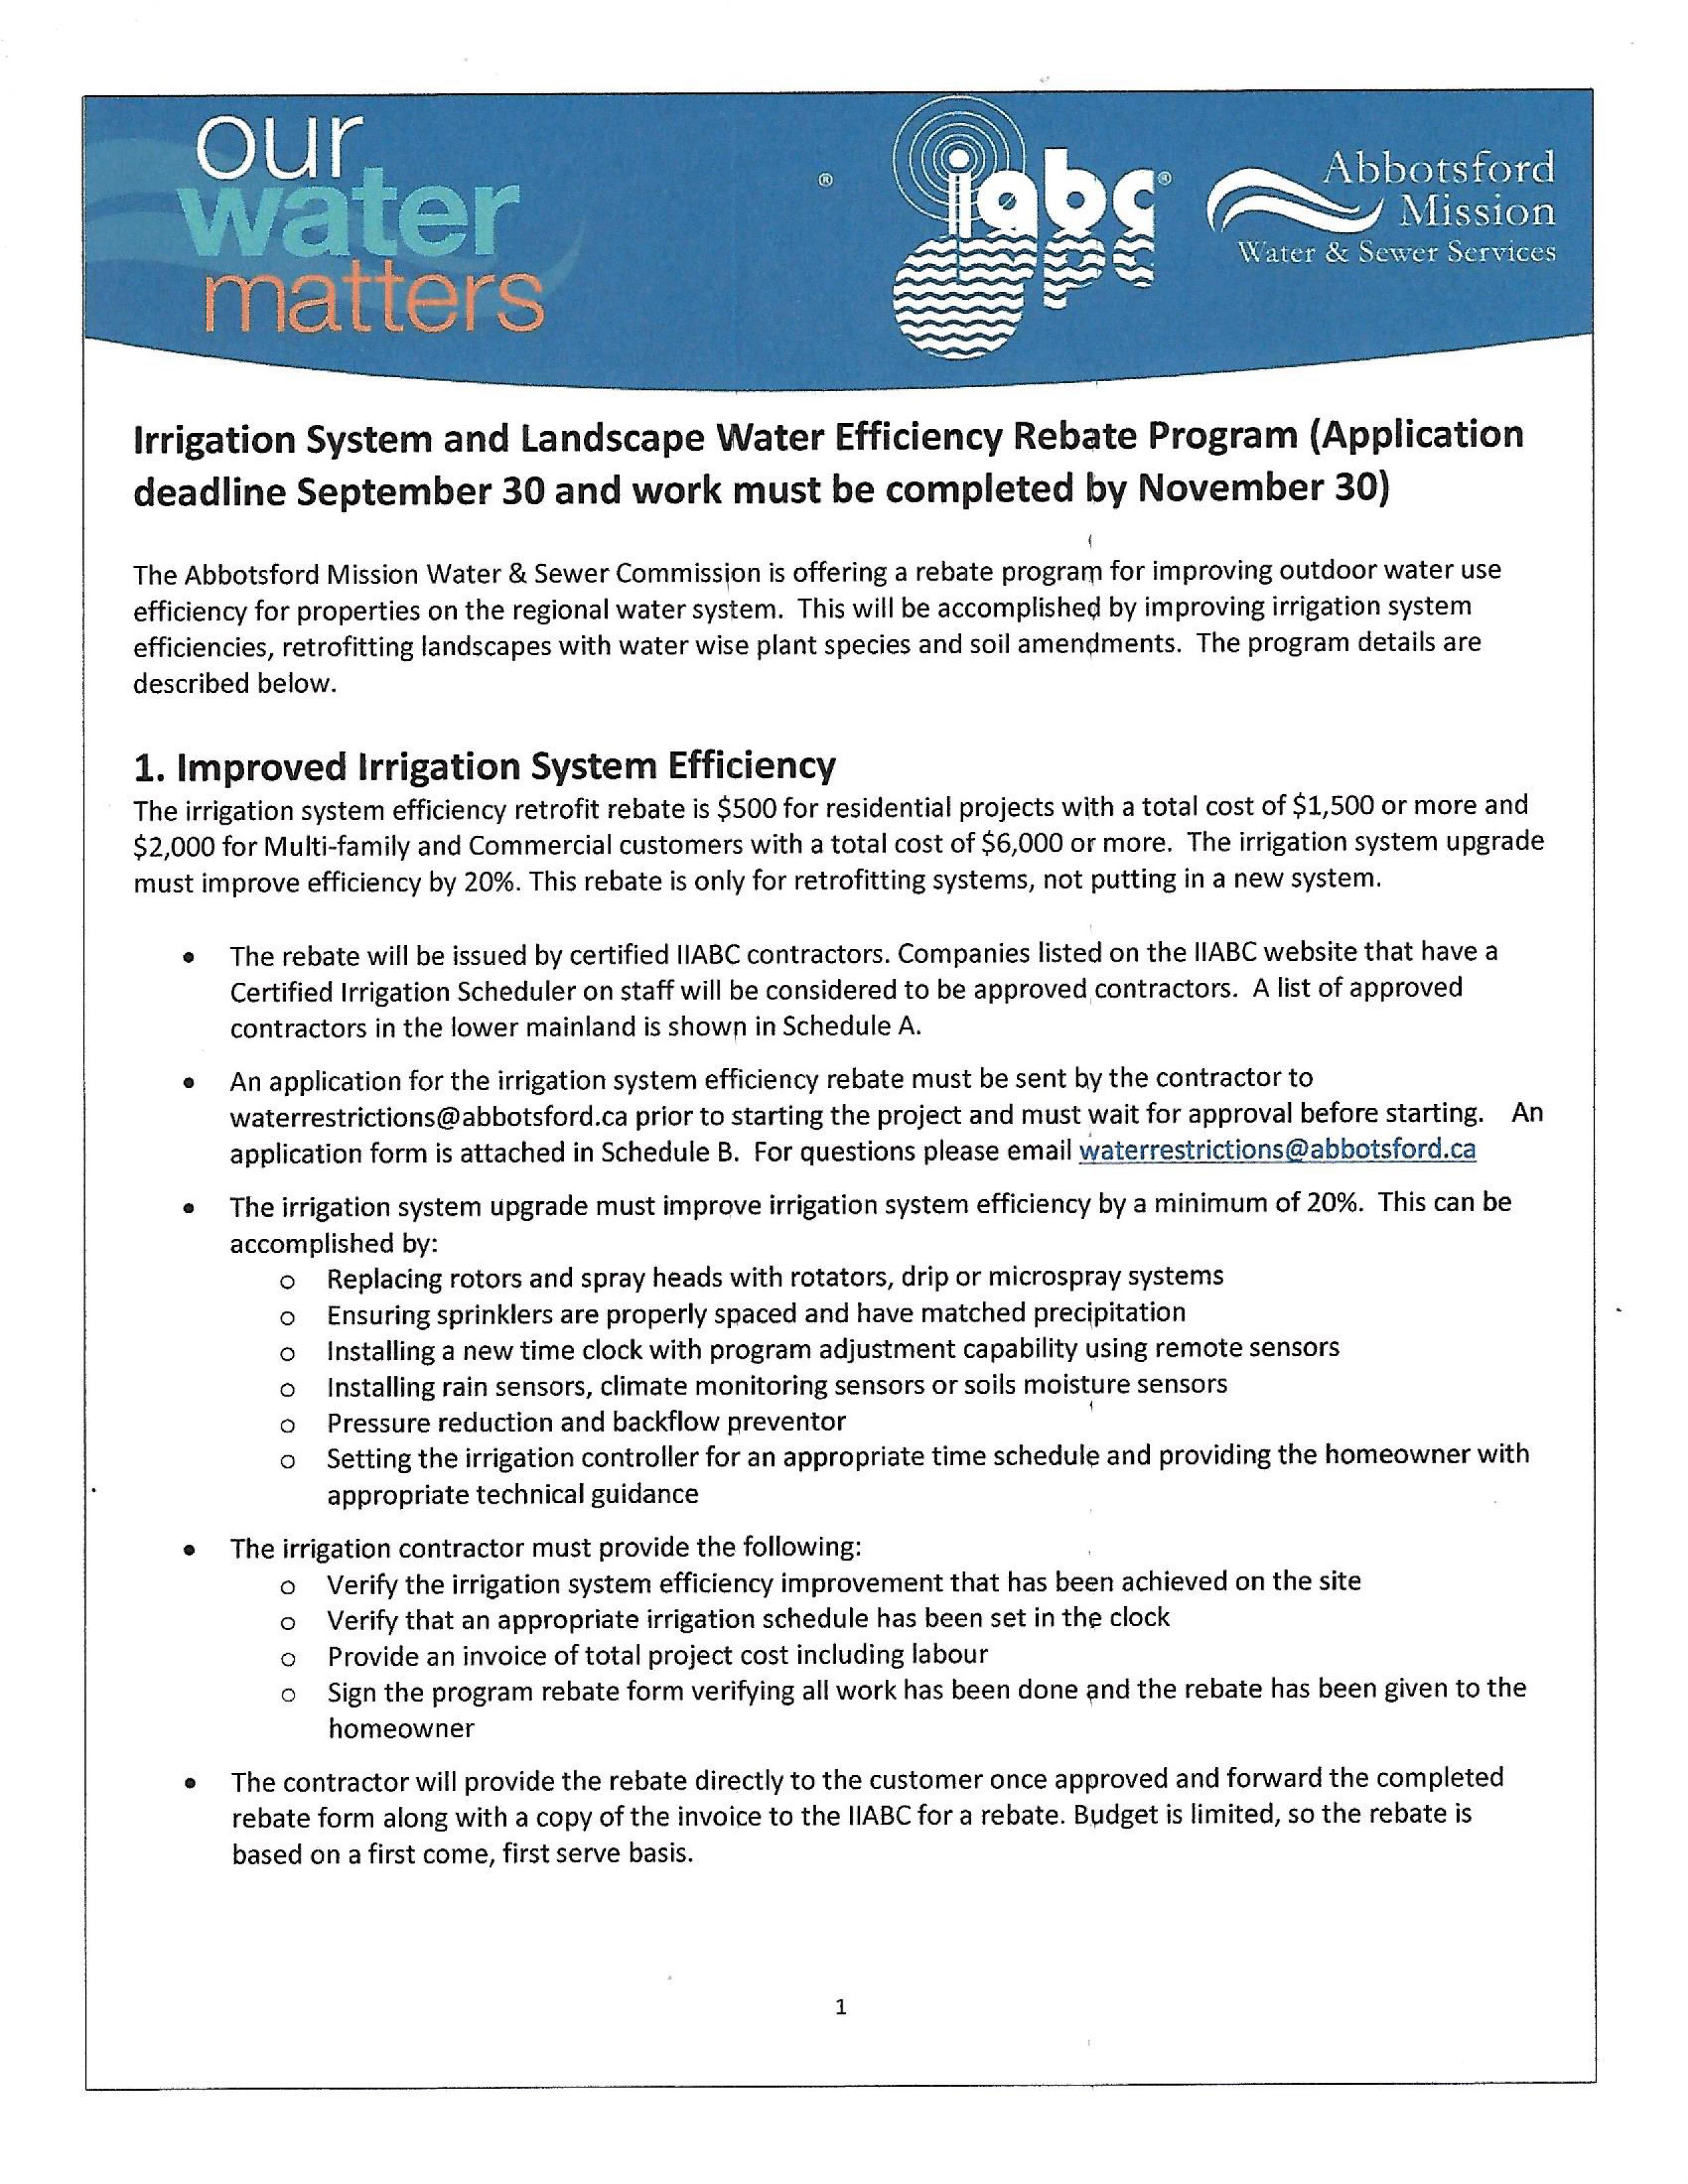 Irrigation industry association of bc news abbotsfordmission irrigation landscape water efficiency rebate program xflitez Choice Image